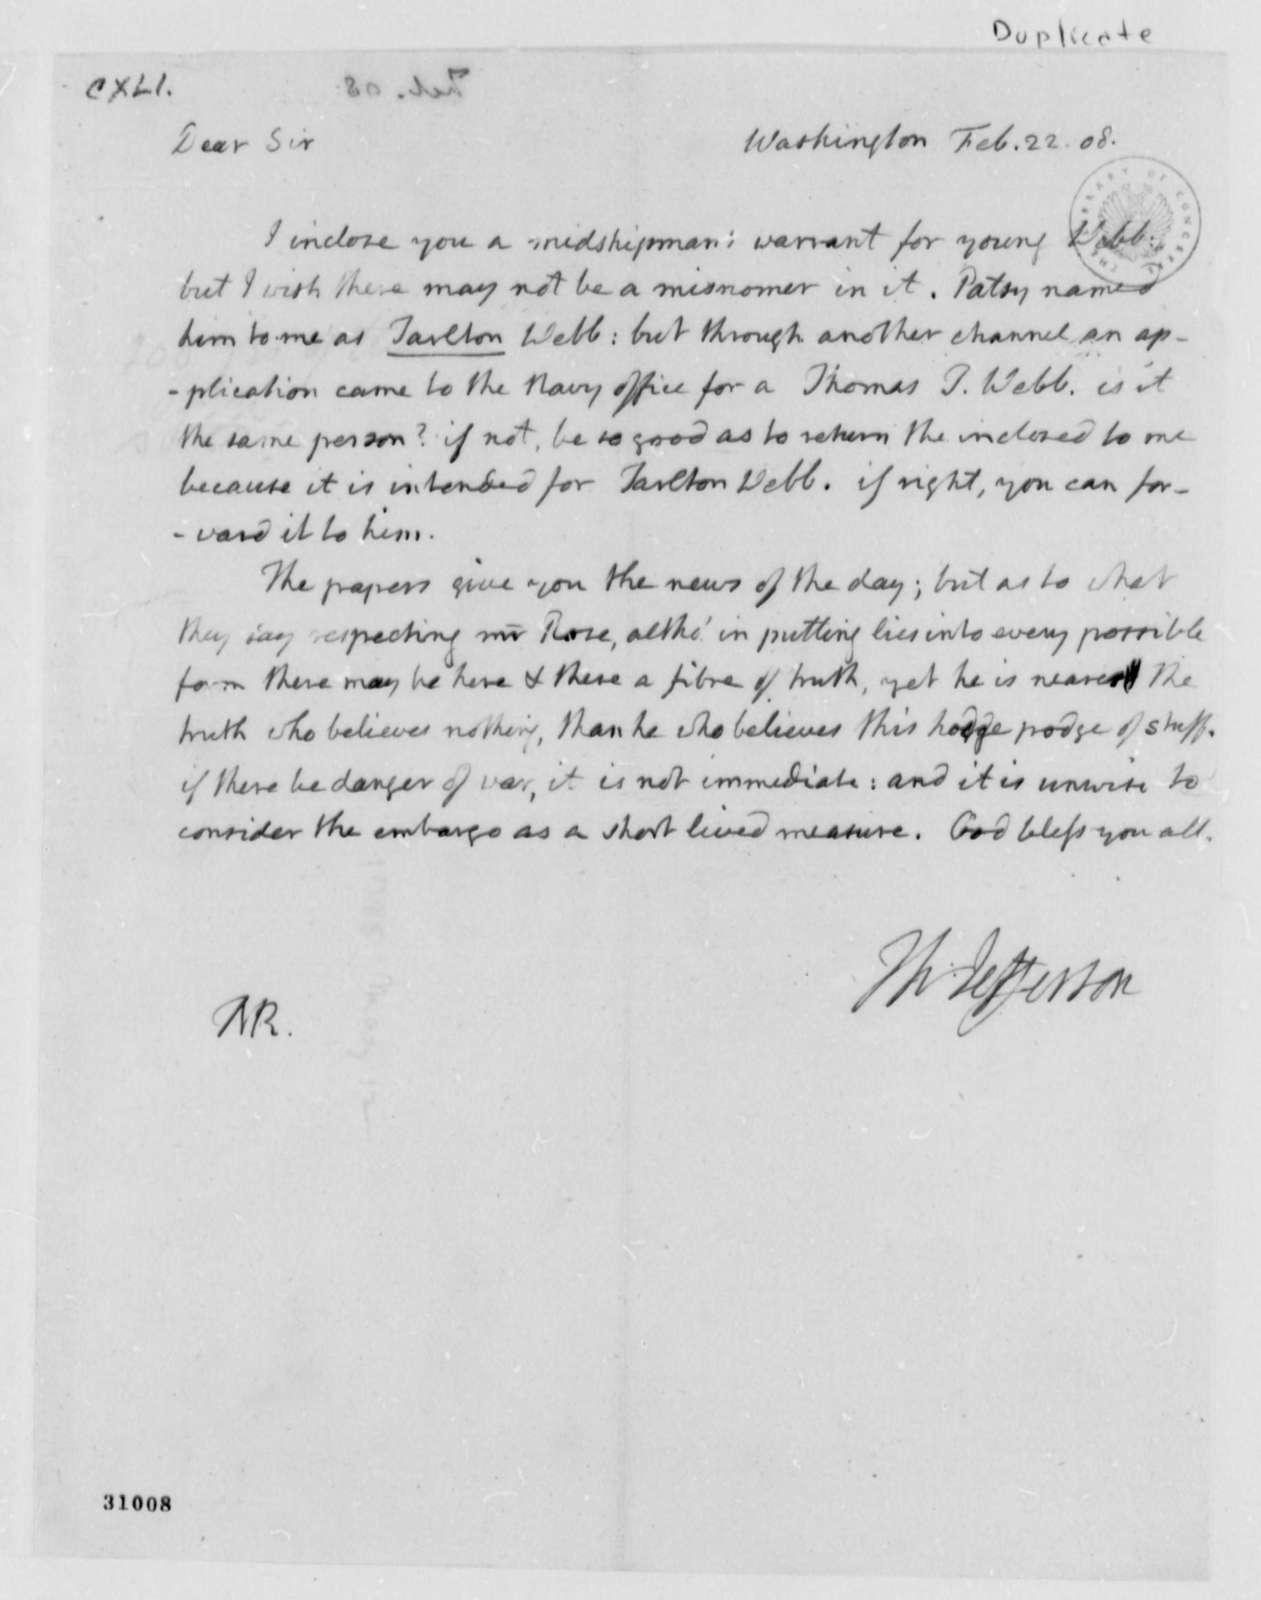 Thomas Jefferson to Thomass Mann Randolph, Jr., February 22, 1808, with Copy